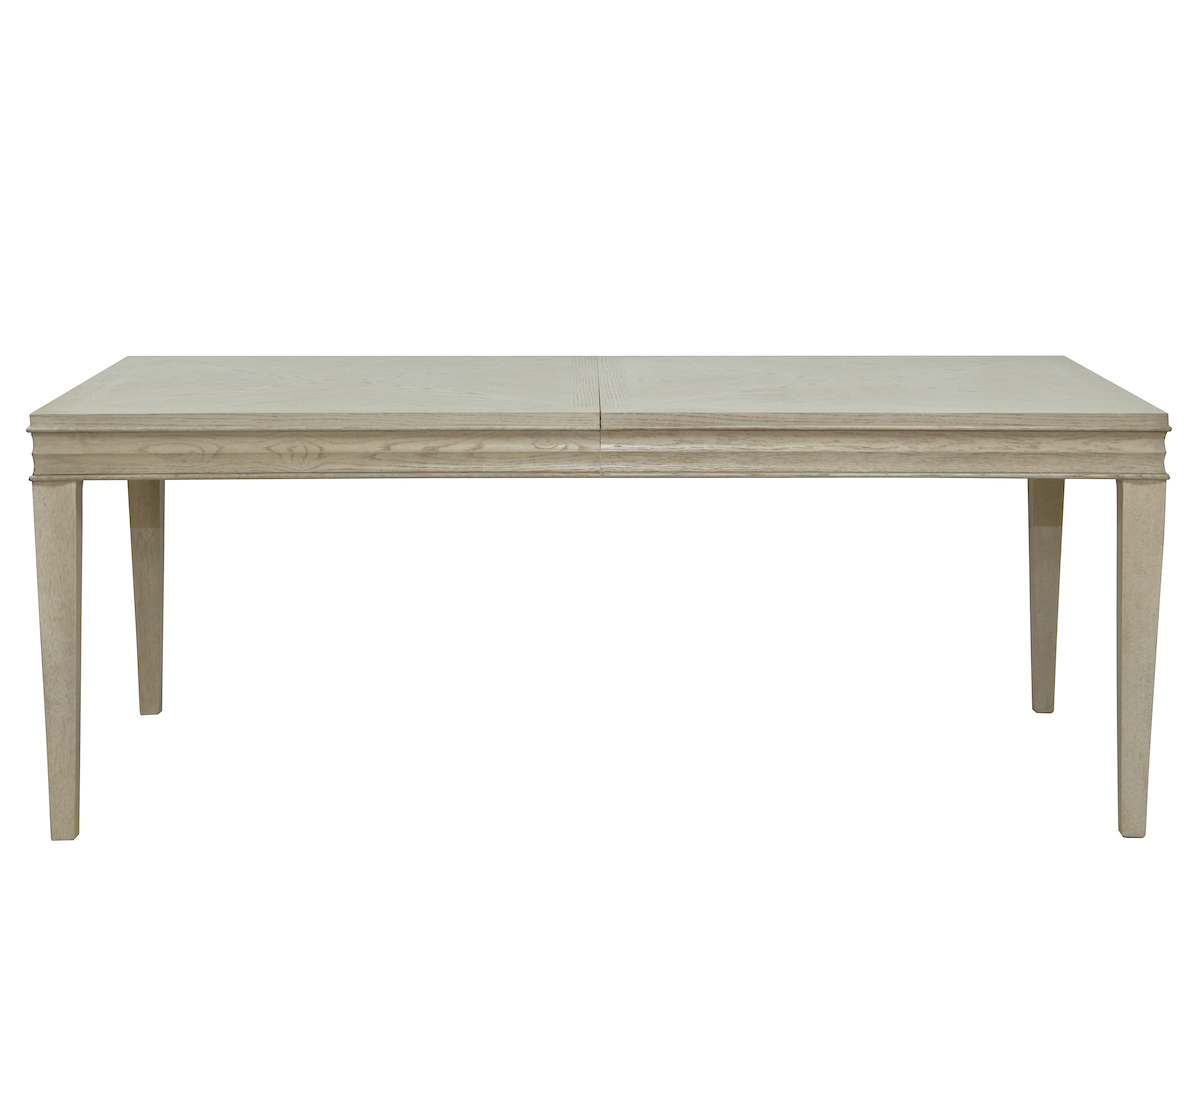 Vermont Extending Dining Table 198cm - 280cm